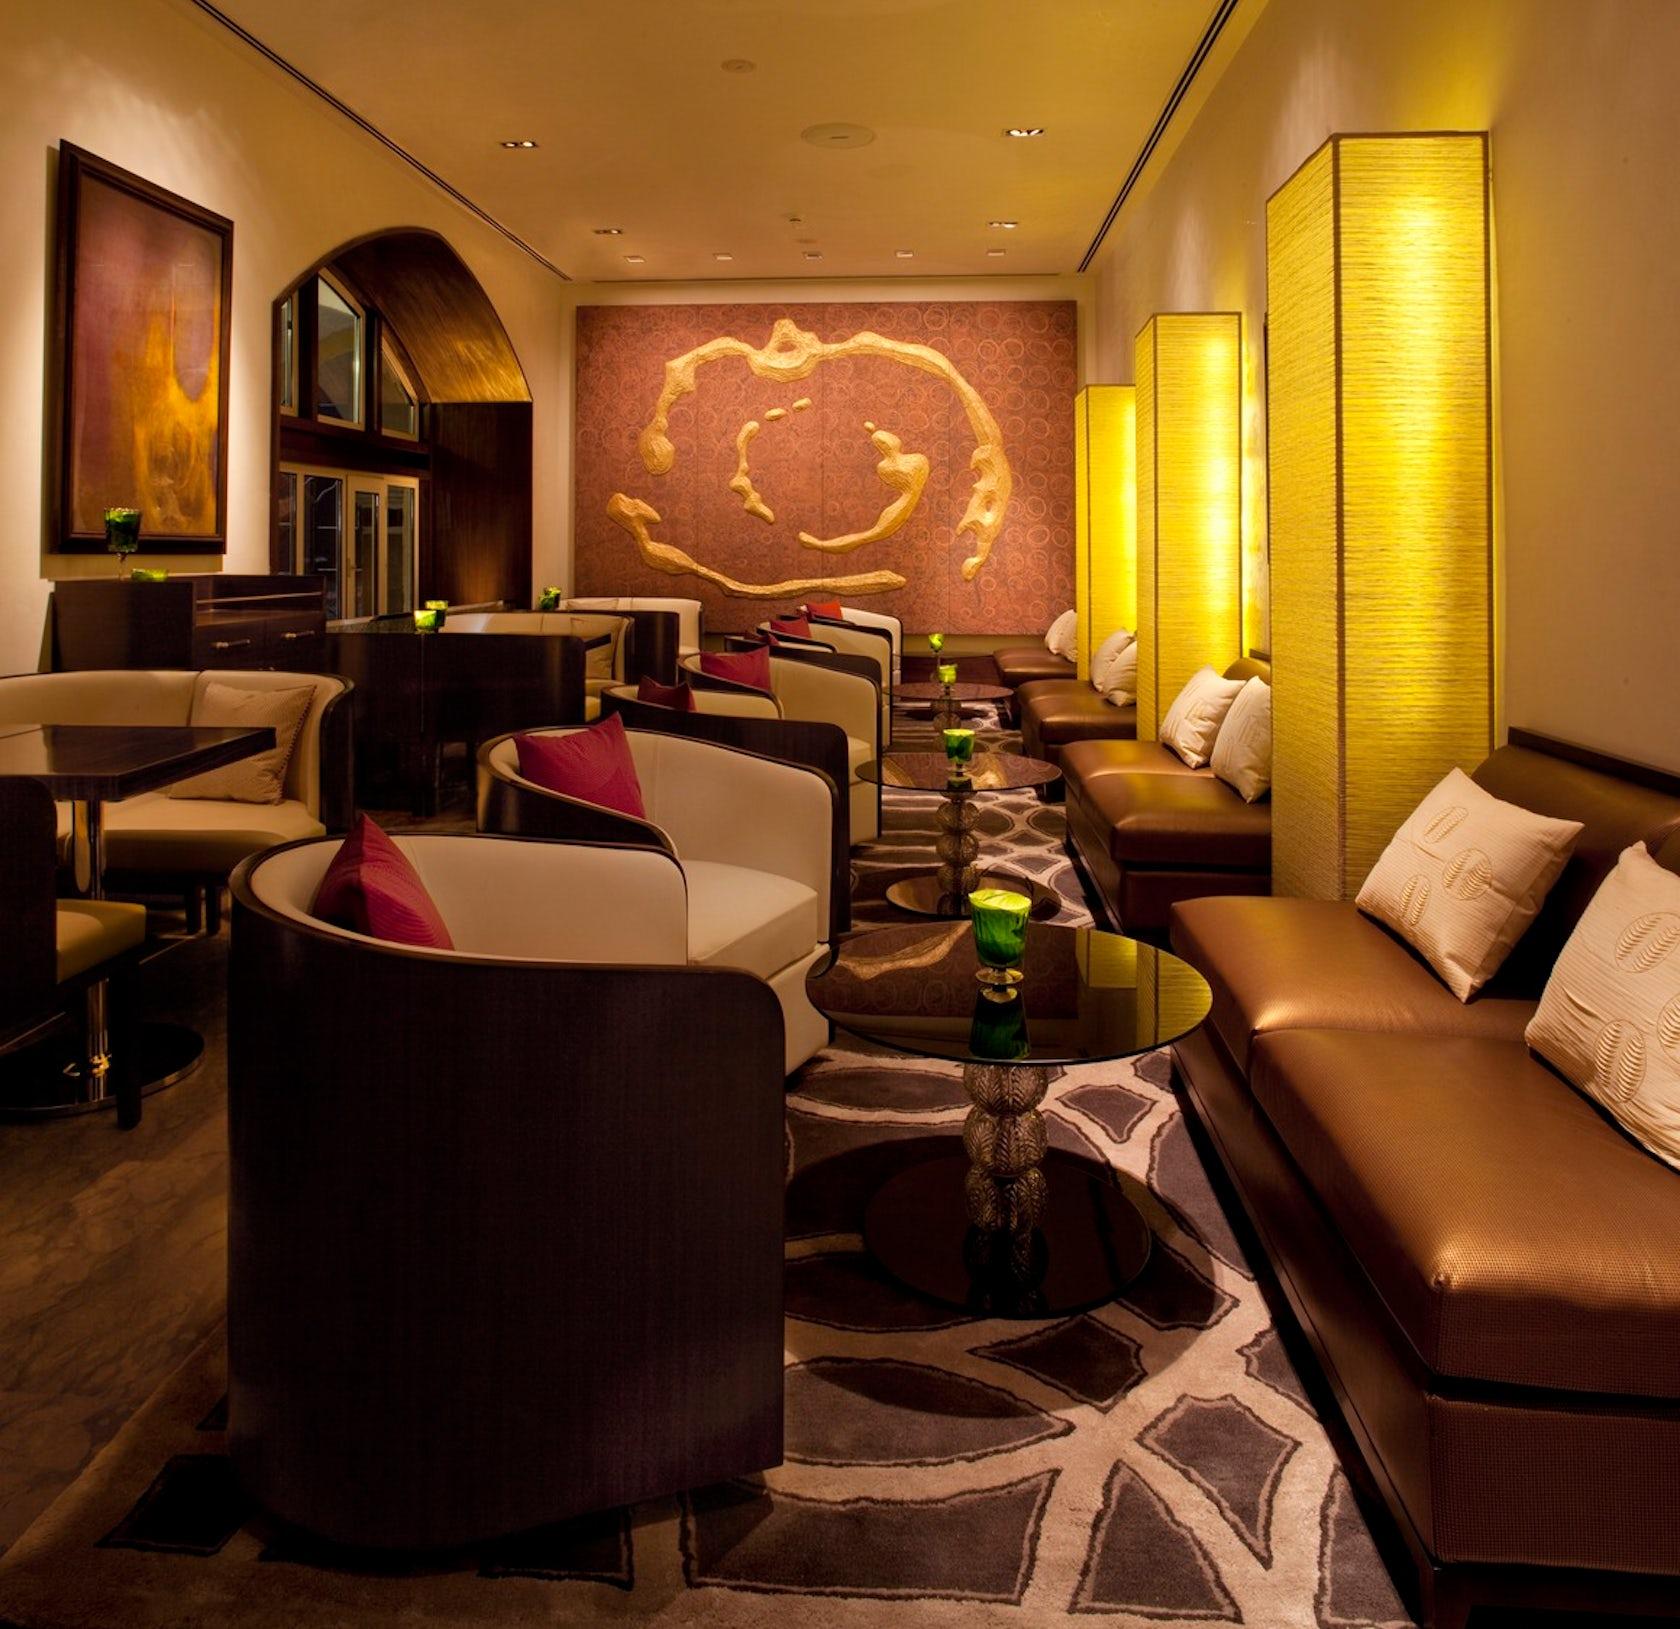 Medium Hotel Interior: Rockwell Group, Madrid